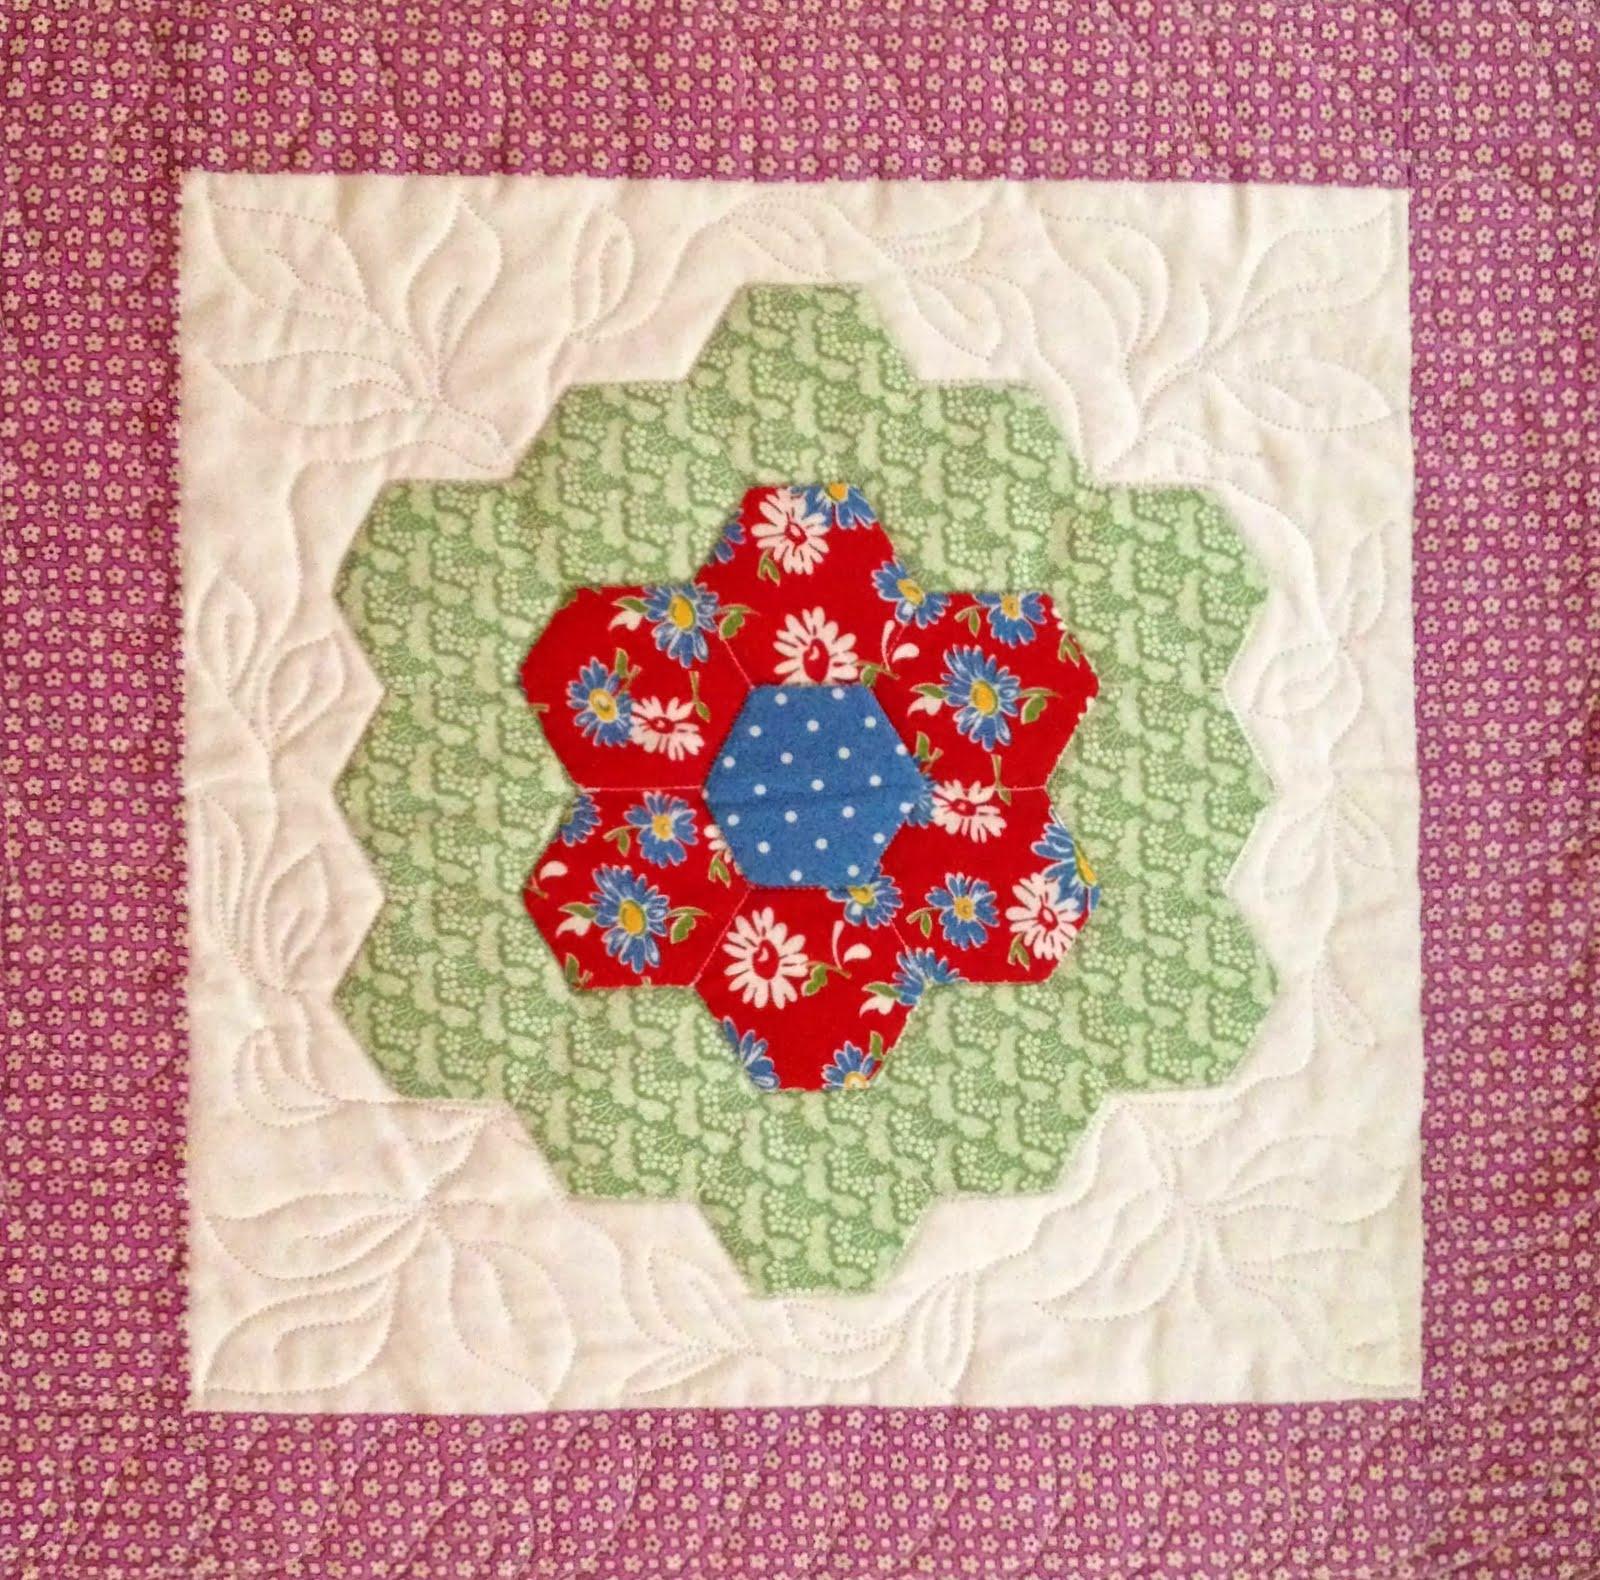 Starwood quilter grandmother 39 s flower garden quilt block - Grandmother s flower garden quilt ...